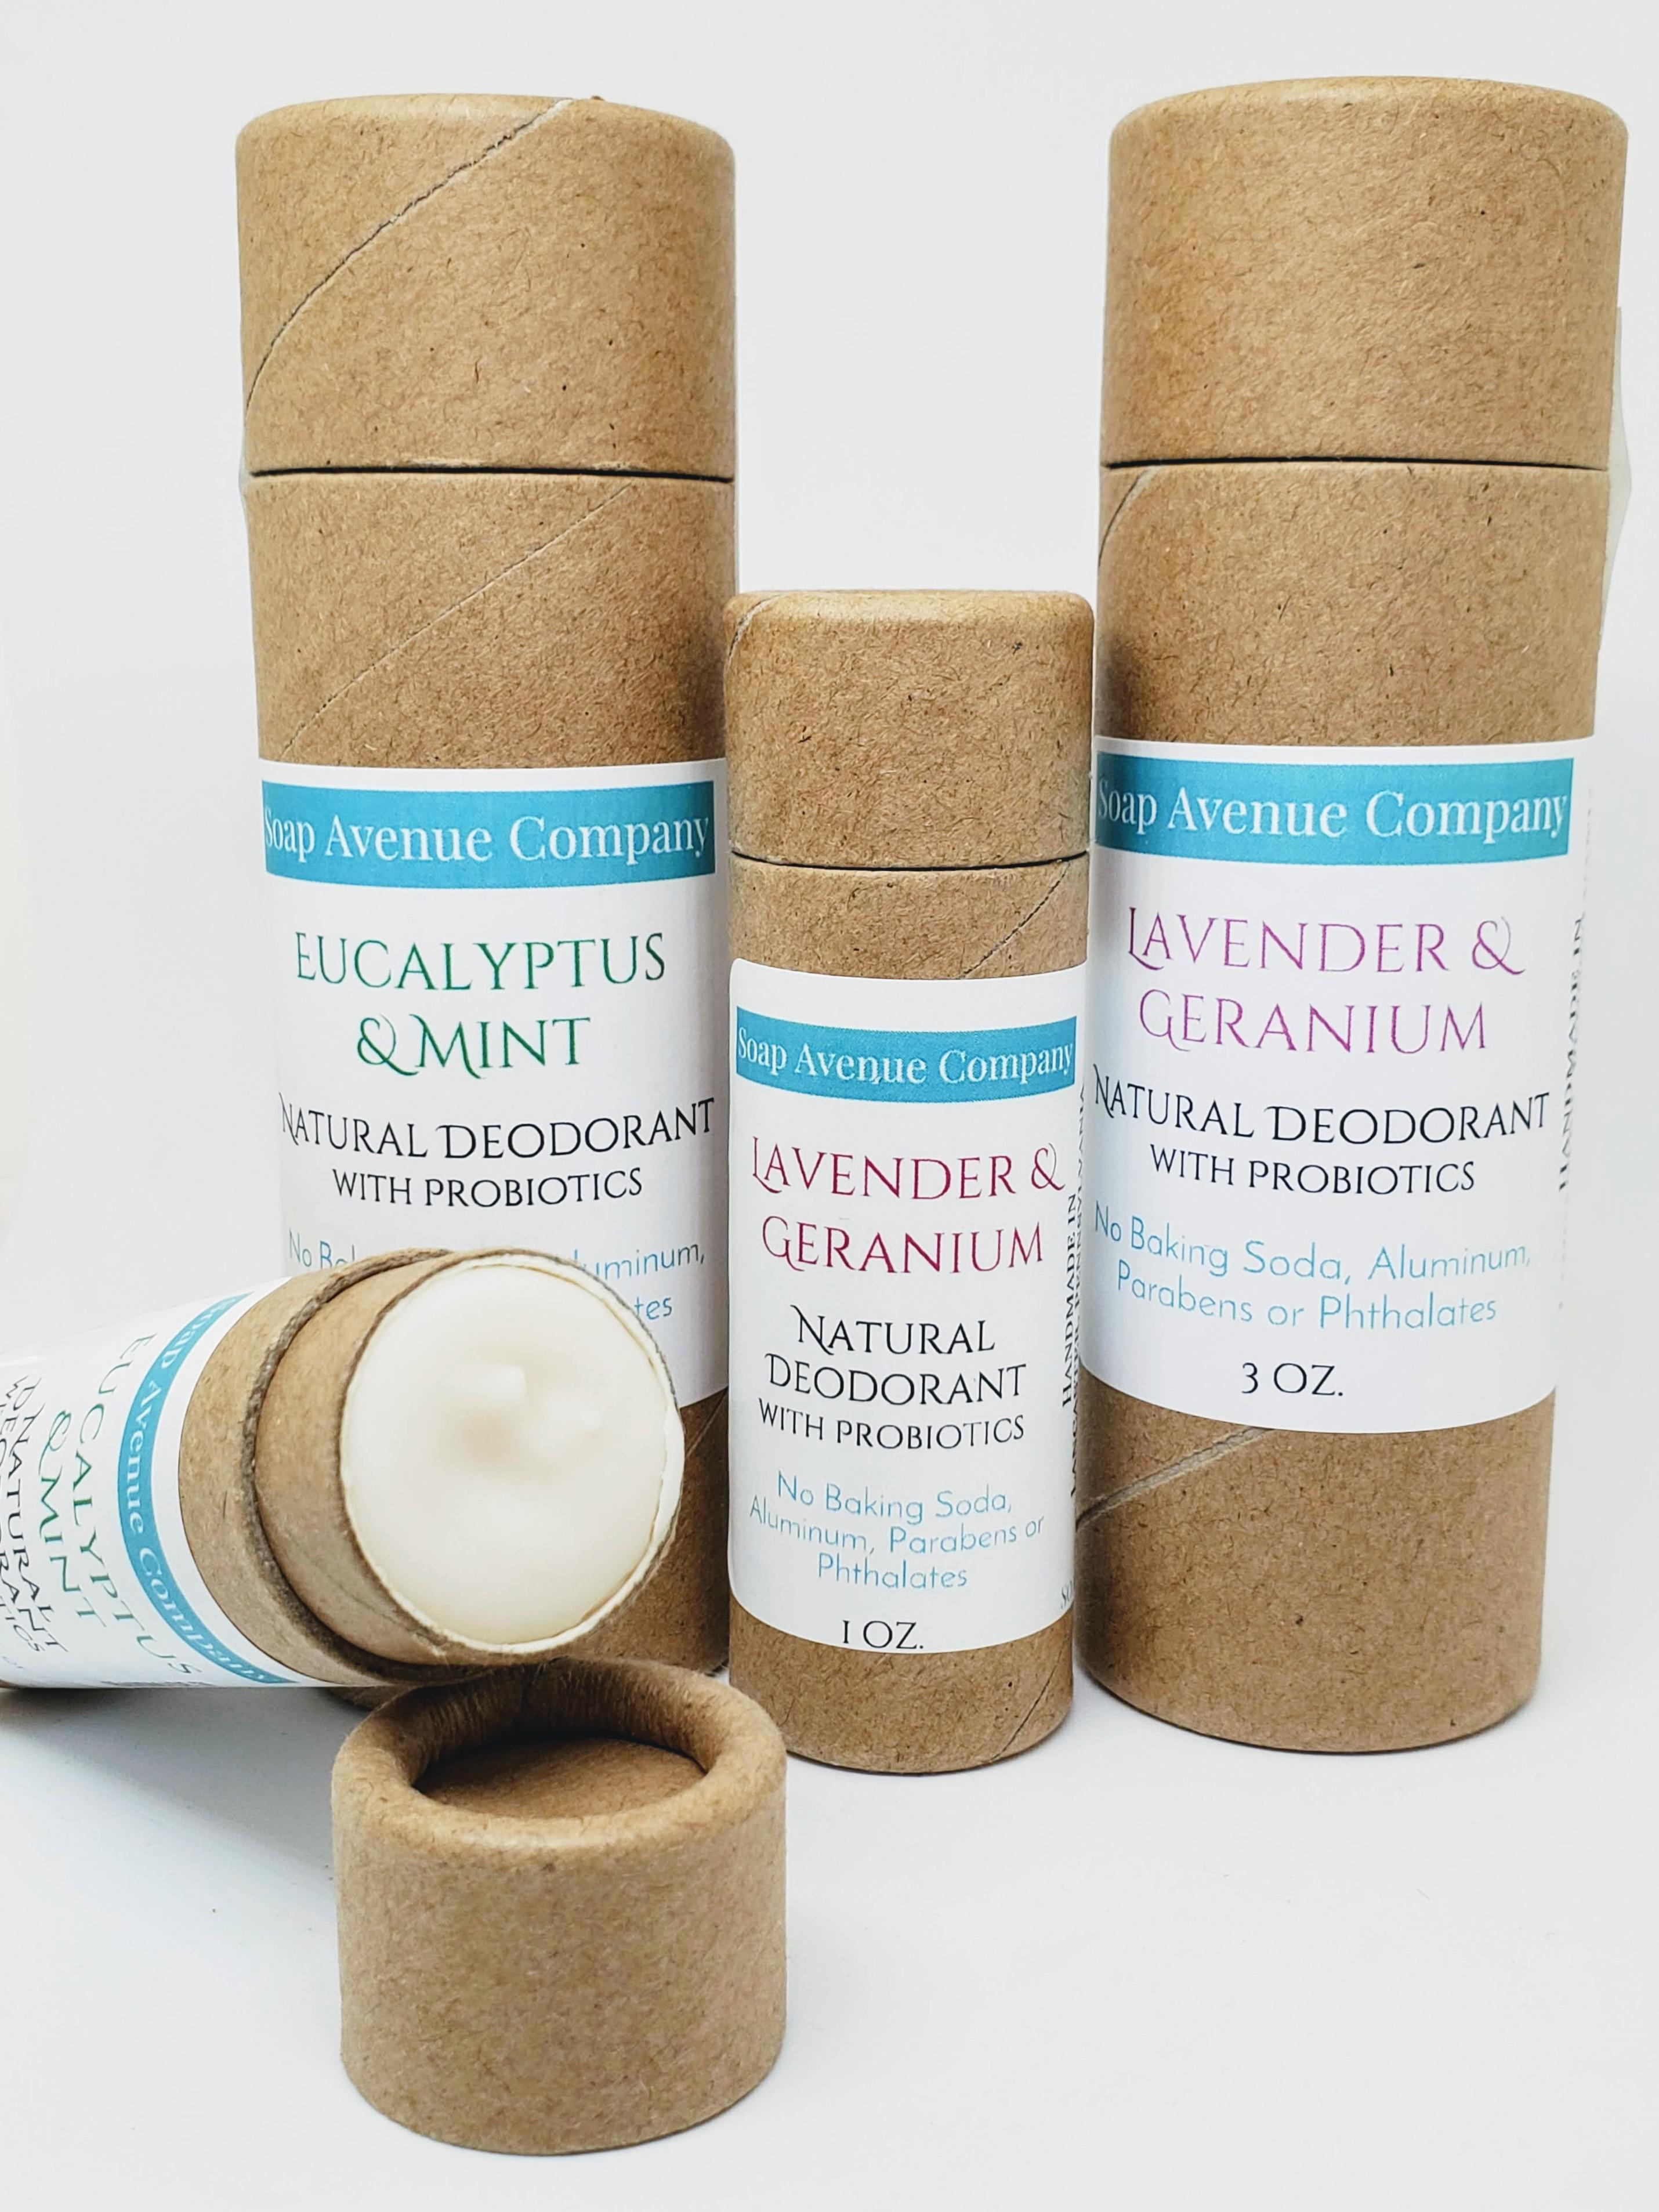 Natural Deodorant with Probiotics ~ No Baking-Soda, Aluminum, Parabens or  Phthalates